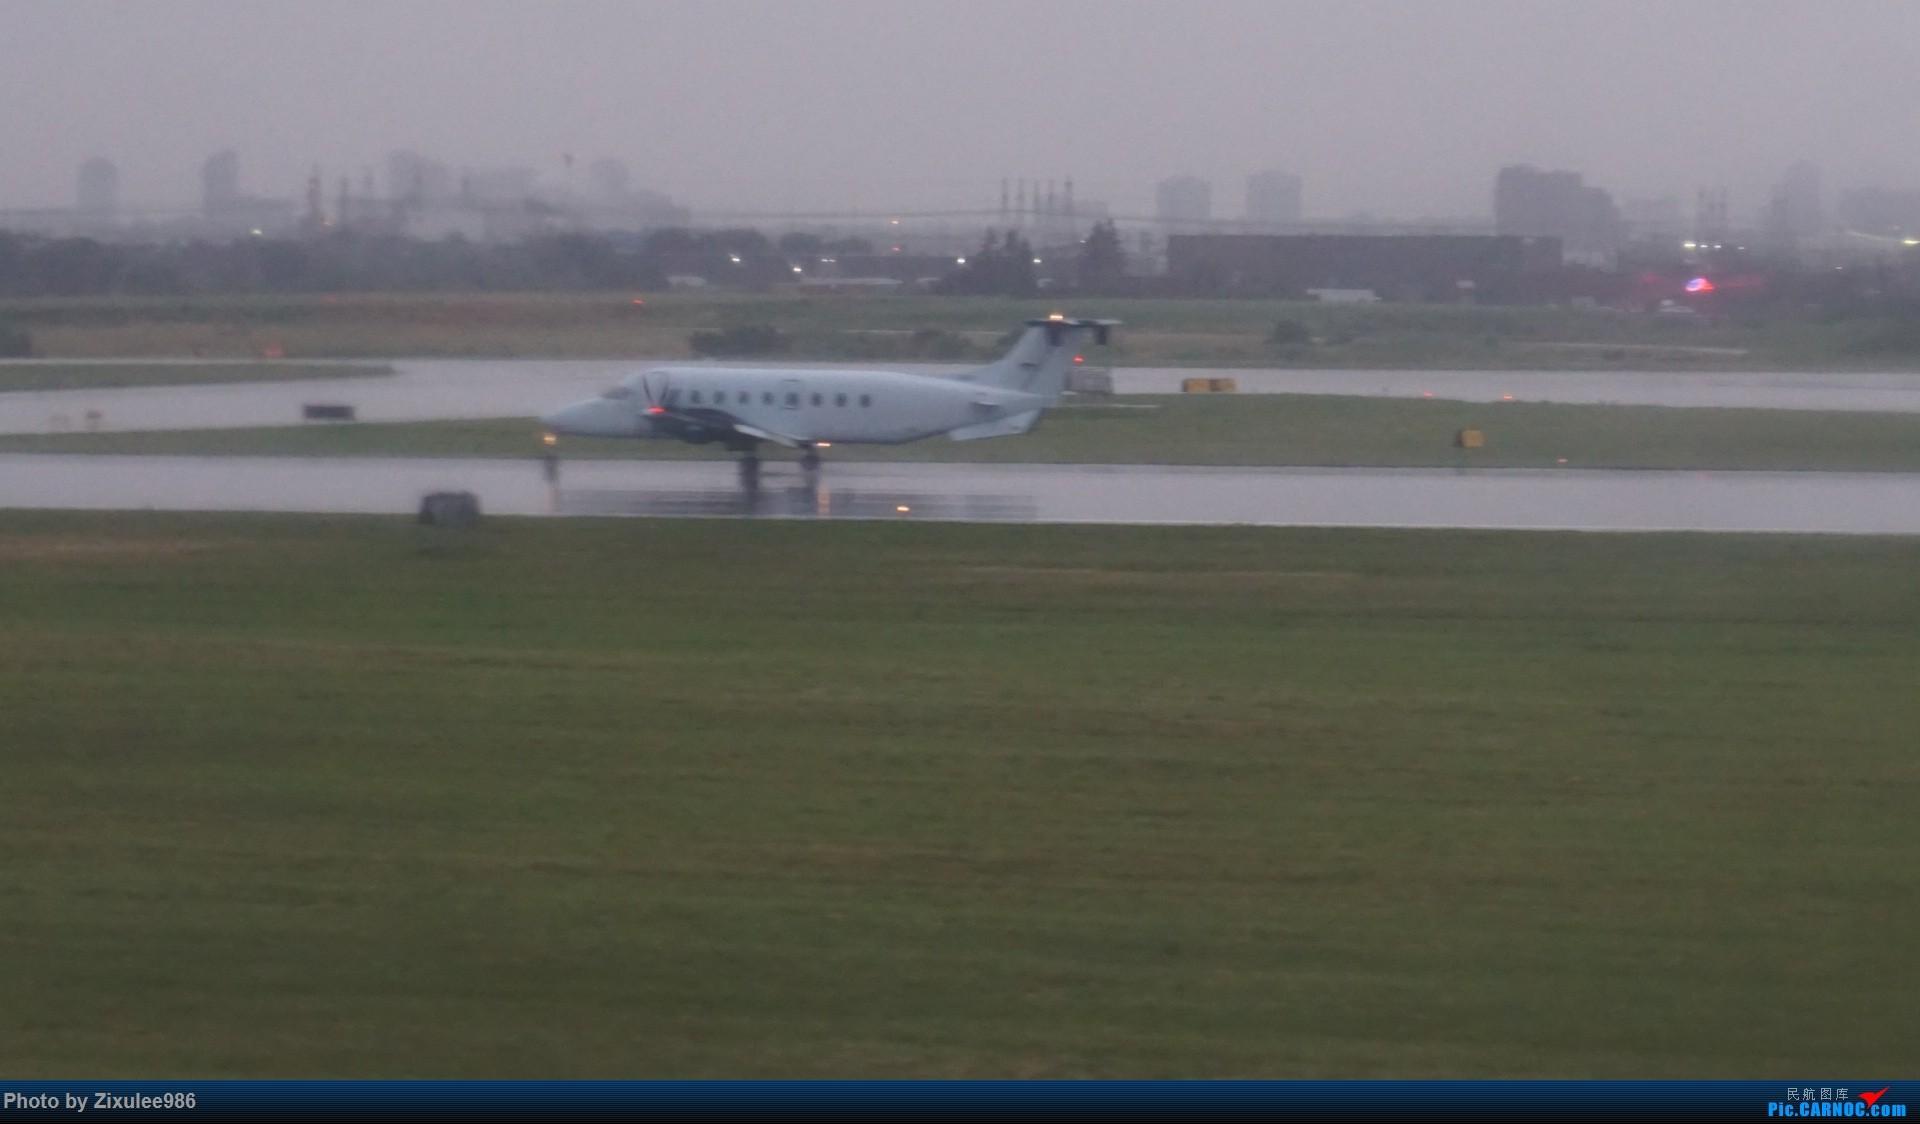 Re:[原创]加拿大21日游学之旅 (二)~加航AC28..PVG-YYZ到达多村后的雨天~多图缓更(将会附上上一集忘发的flightlog)请各位大侠谅解~ CESSNA T206H  加拿大多伦多皮尔逊机场